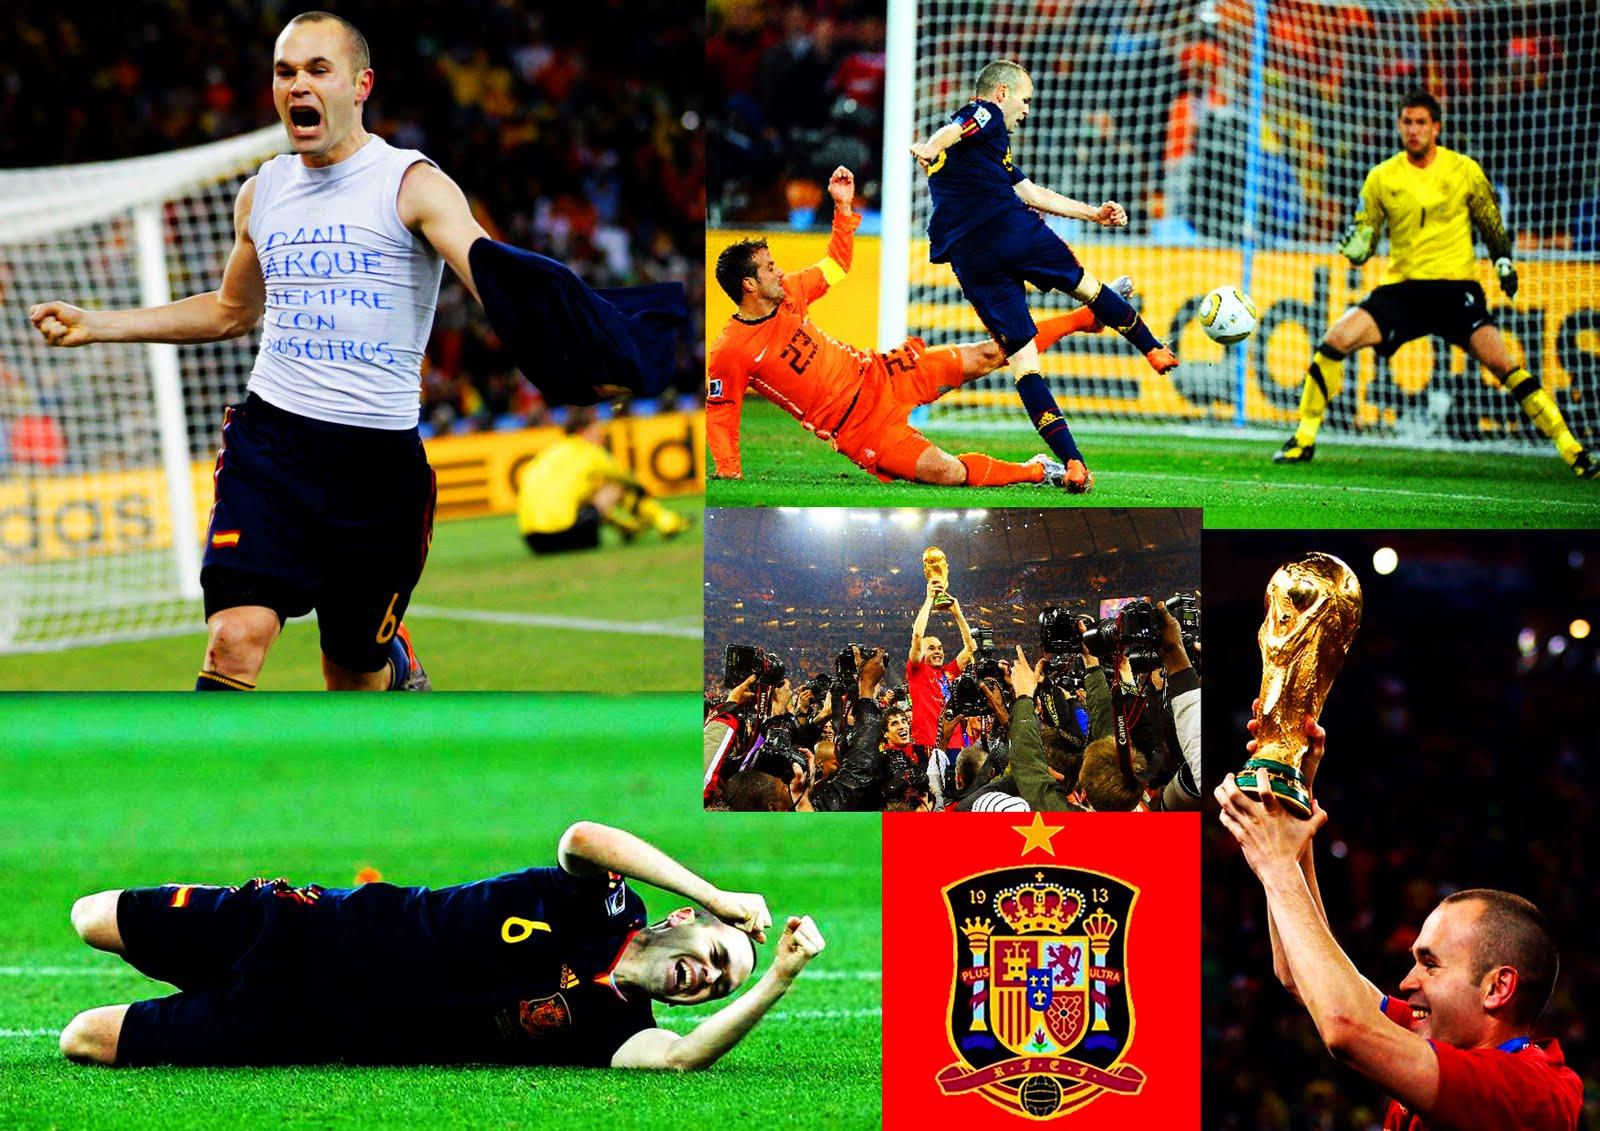 http://3.bp.blogspot.com/-Y95OOPJmGJo/TeDw6b0TU3I/AAAAAAAAE30/SX75mD0HXPk/s1600/Andres+Iniesta+Wallpapers+by+sports+players+%25284%2529.jpg